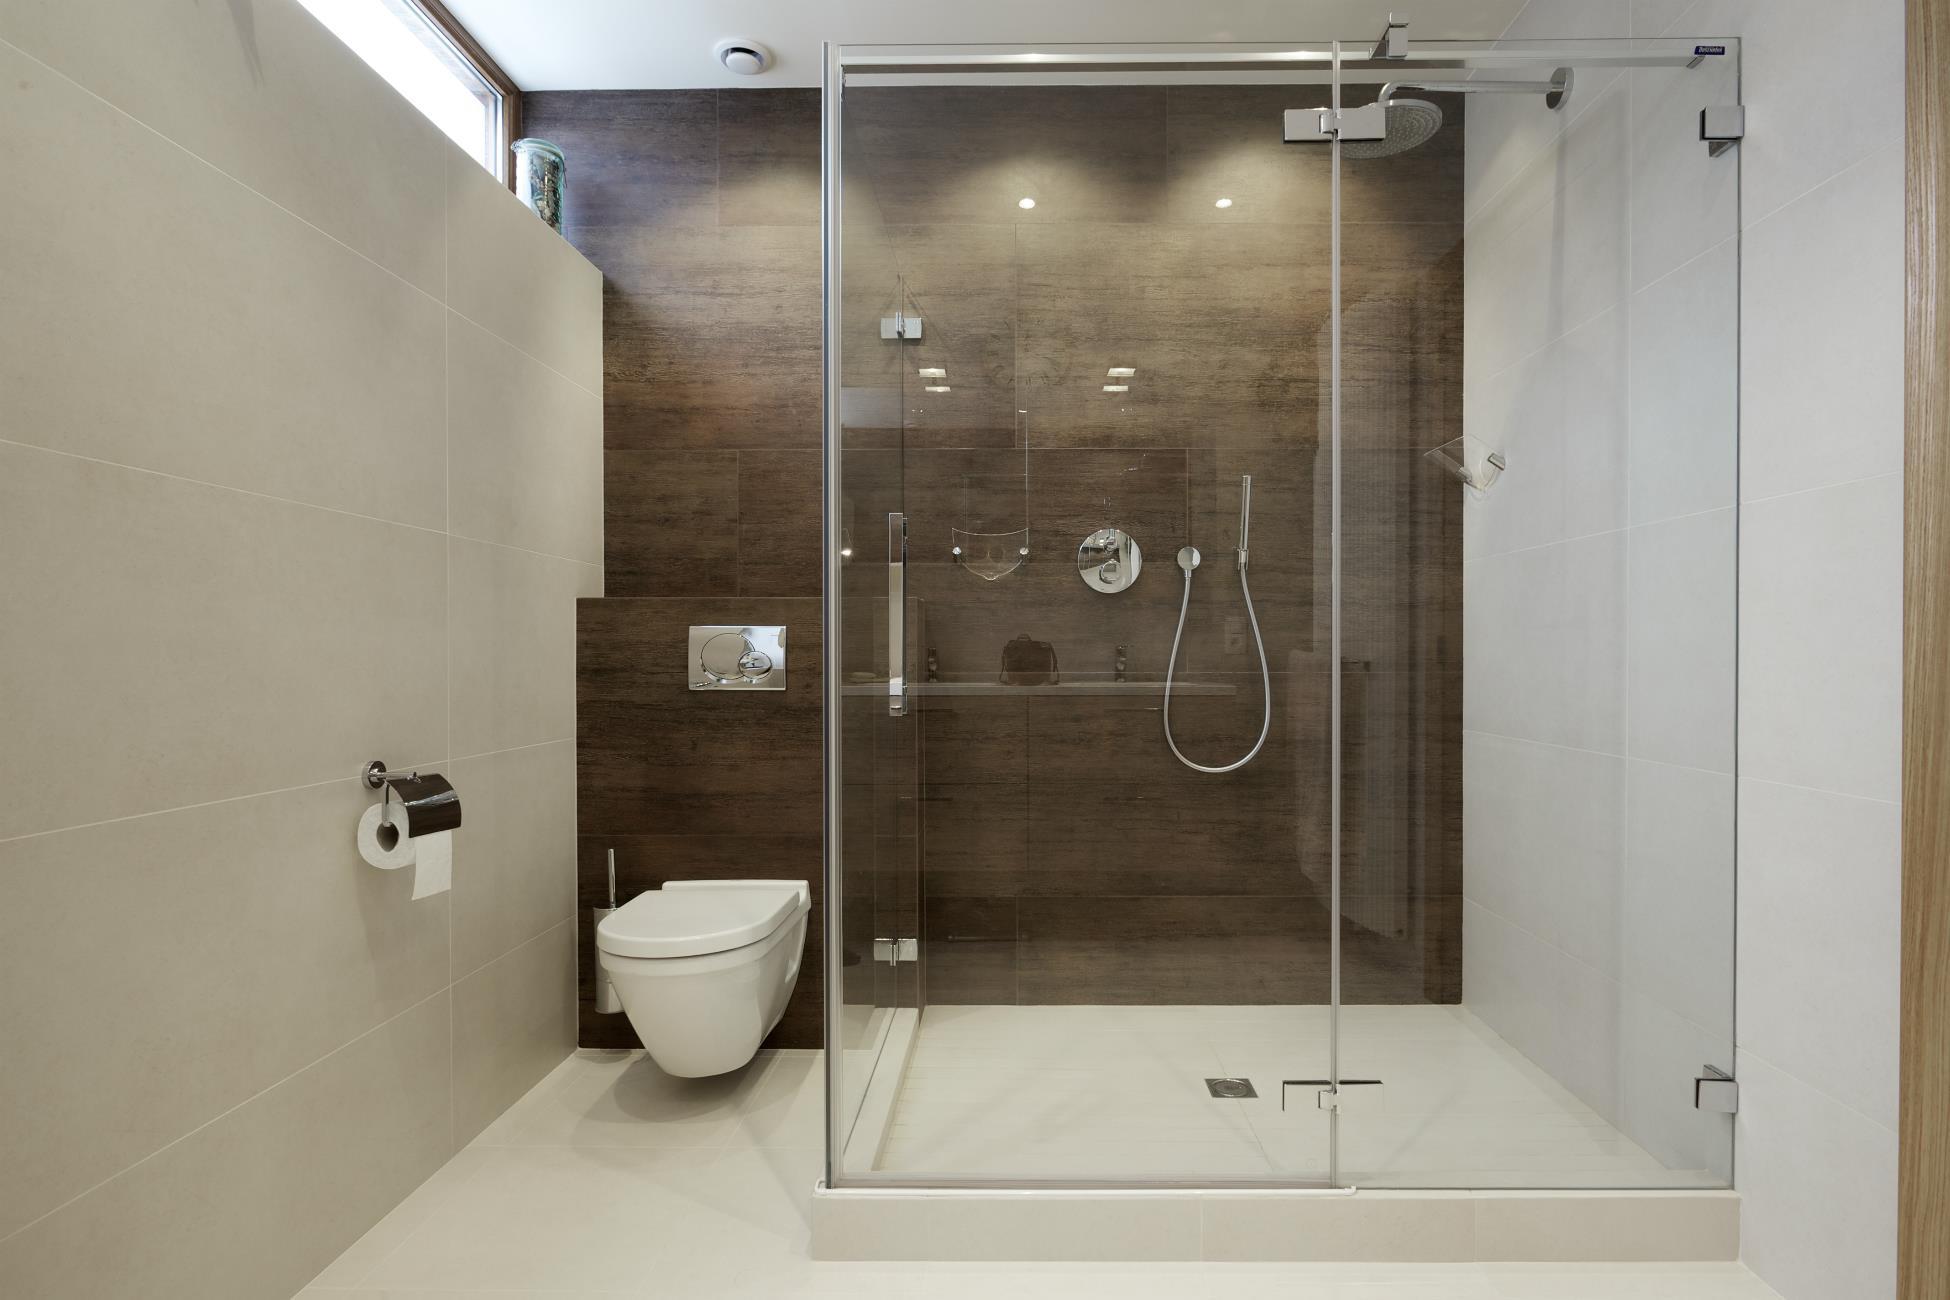 douche a l 39 italienne r alisations renov management. Black Bedroom Furniture Sets. Home Design Ideas